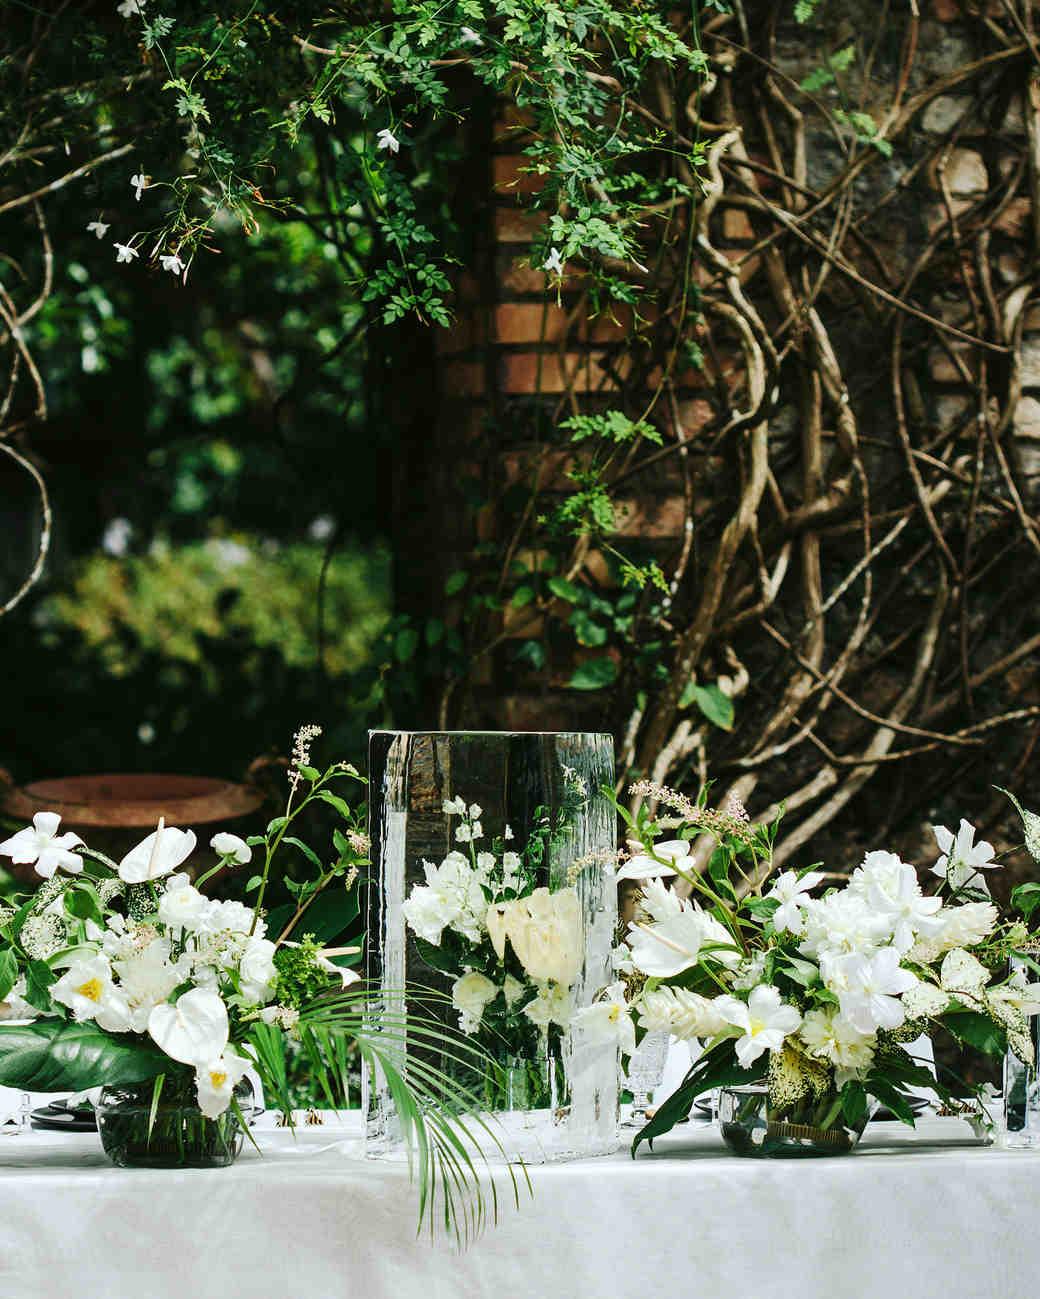 wedding ice sculpture frozen flowers